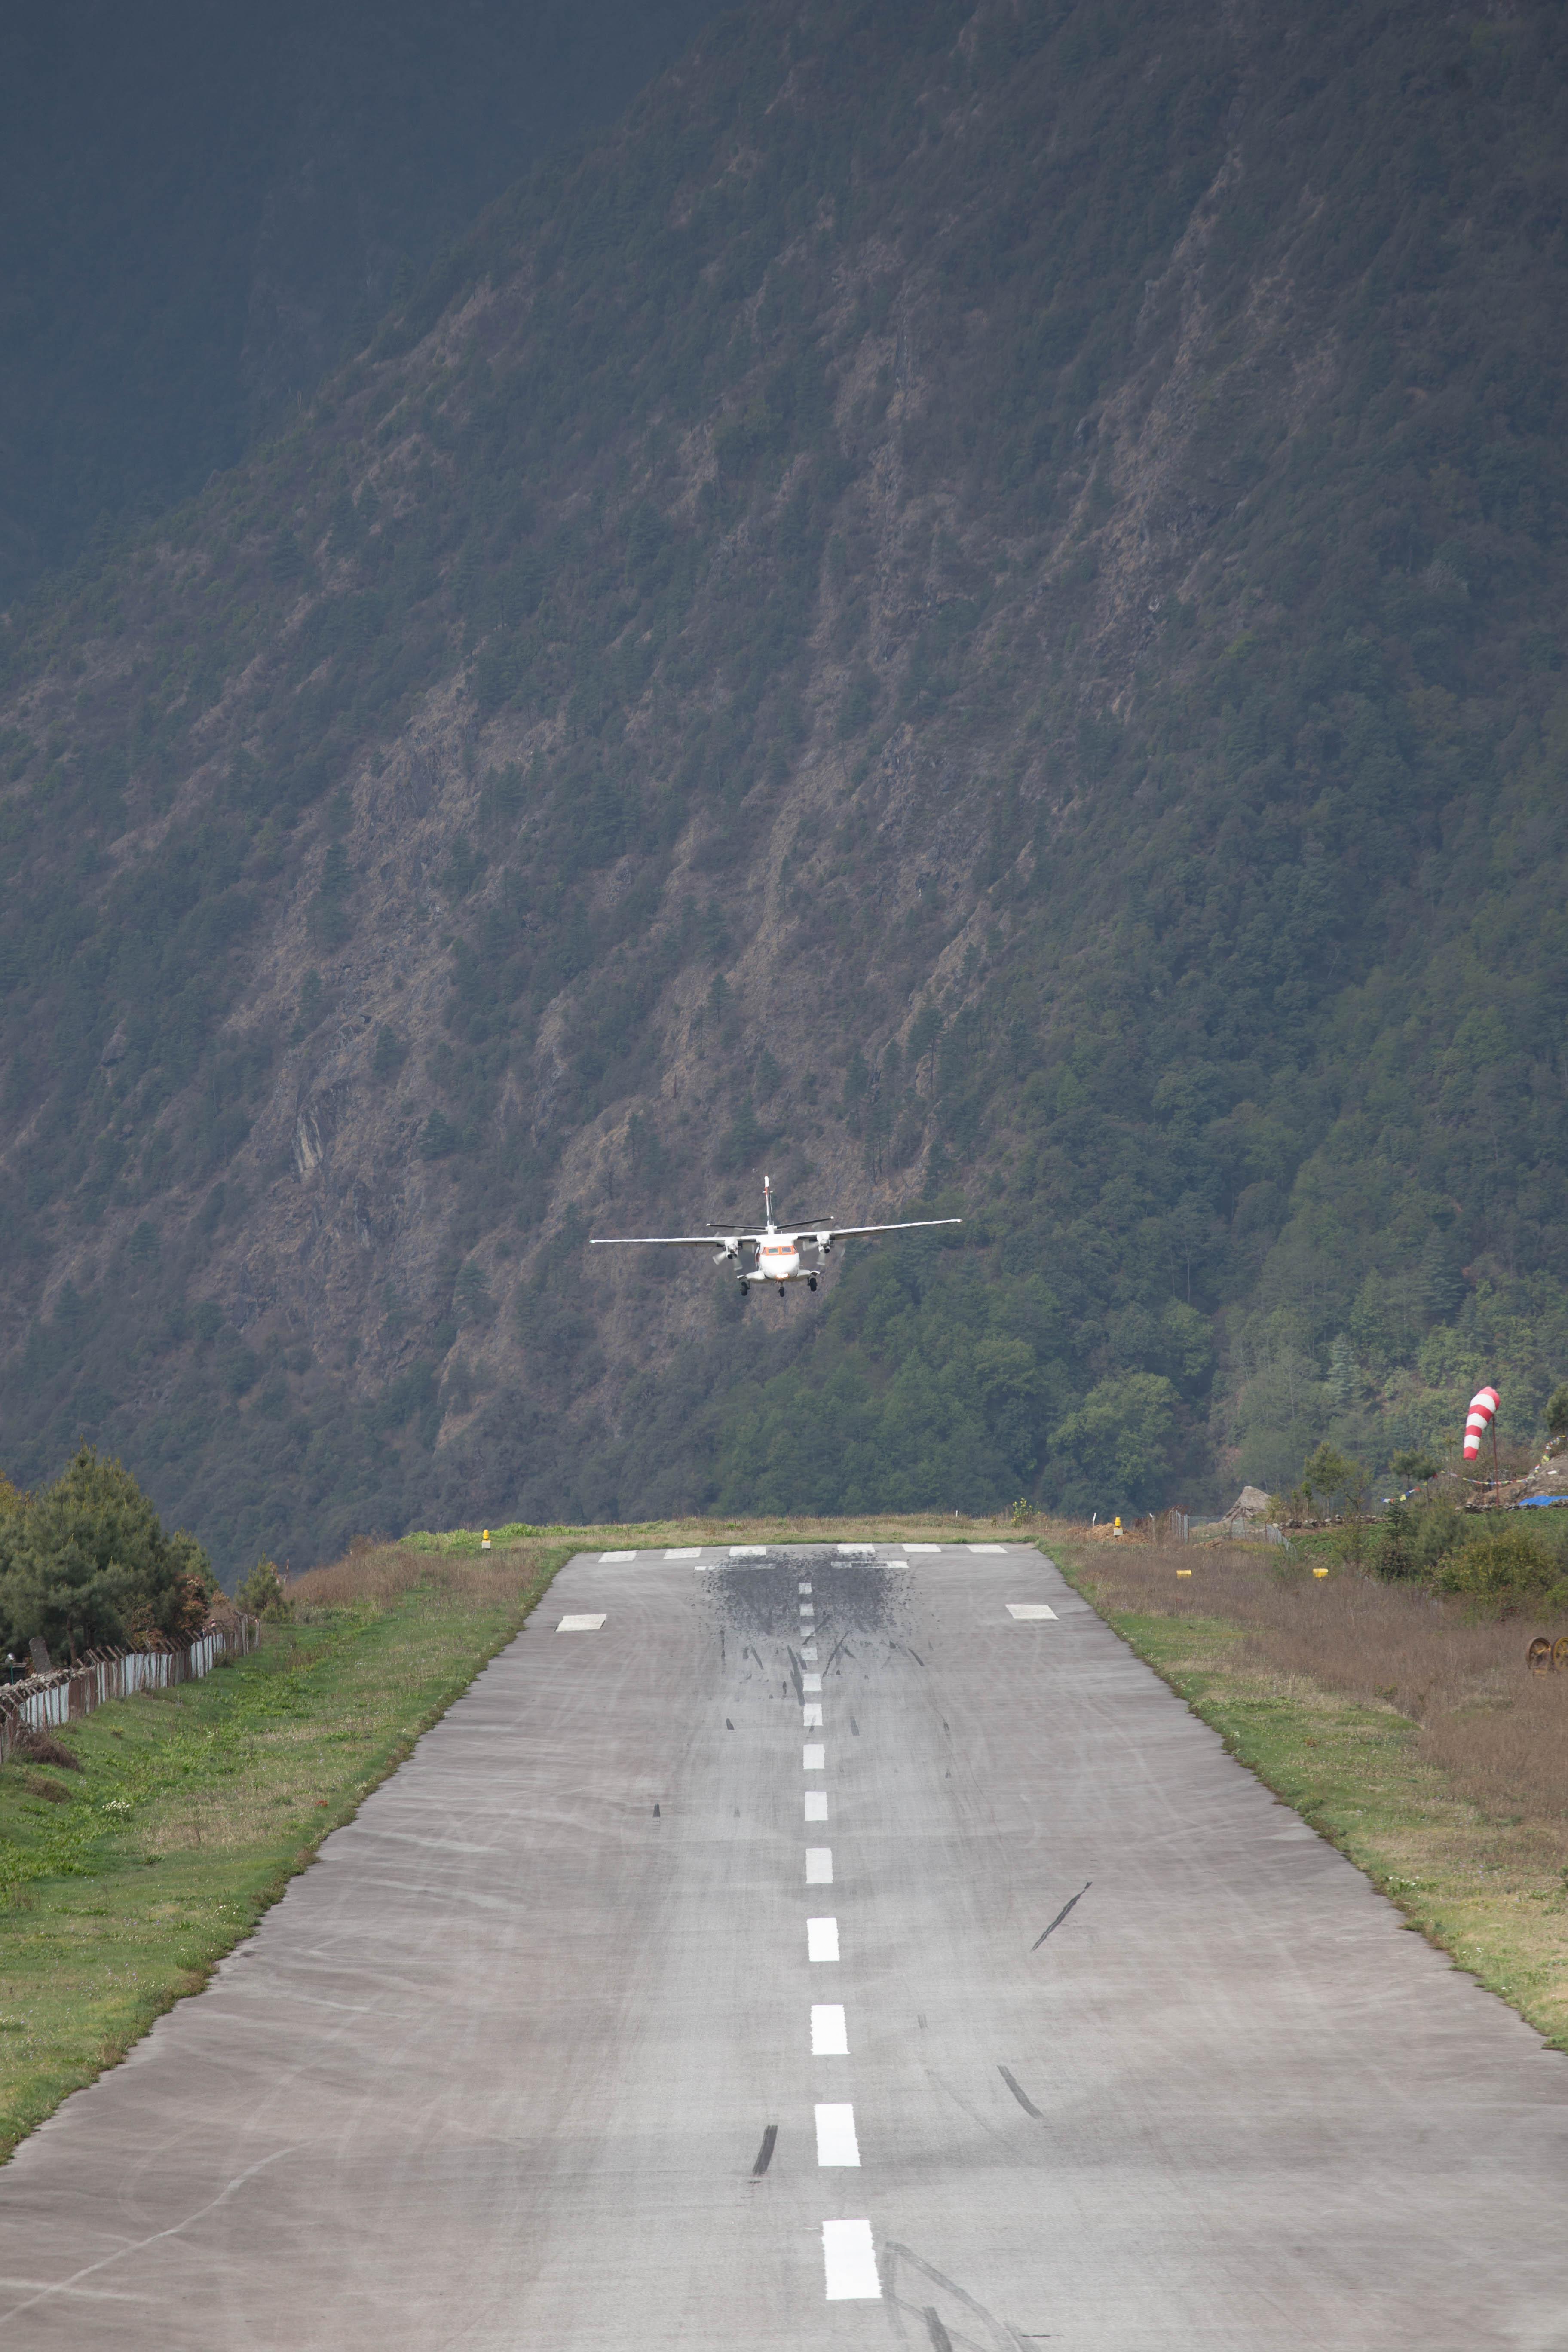 Lukla airport, Nepalese Himalaya